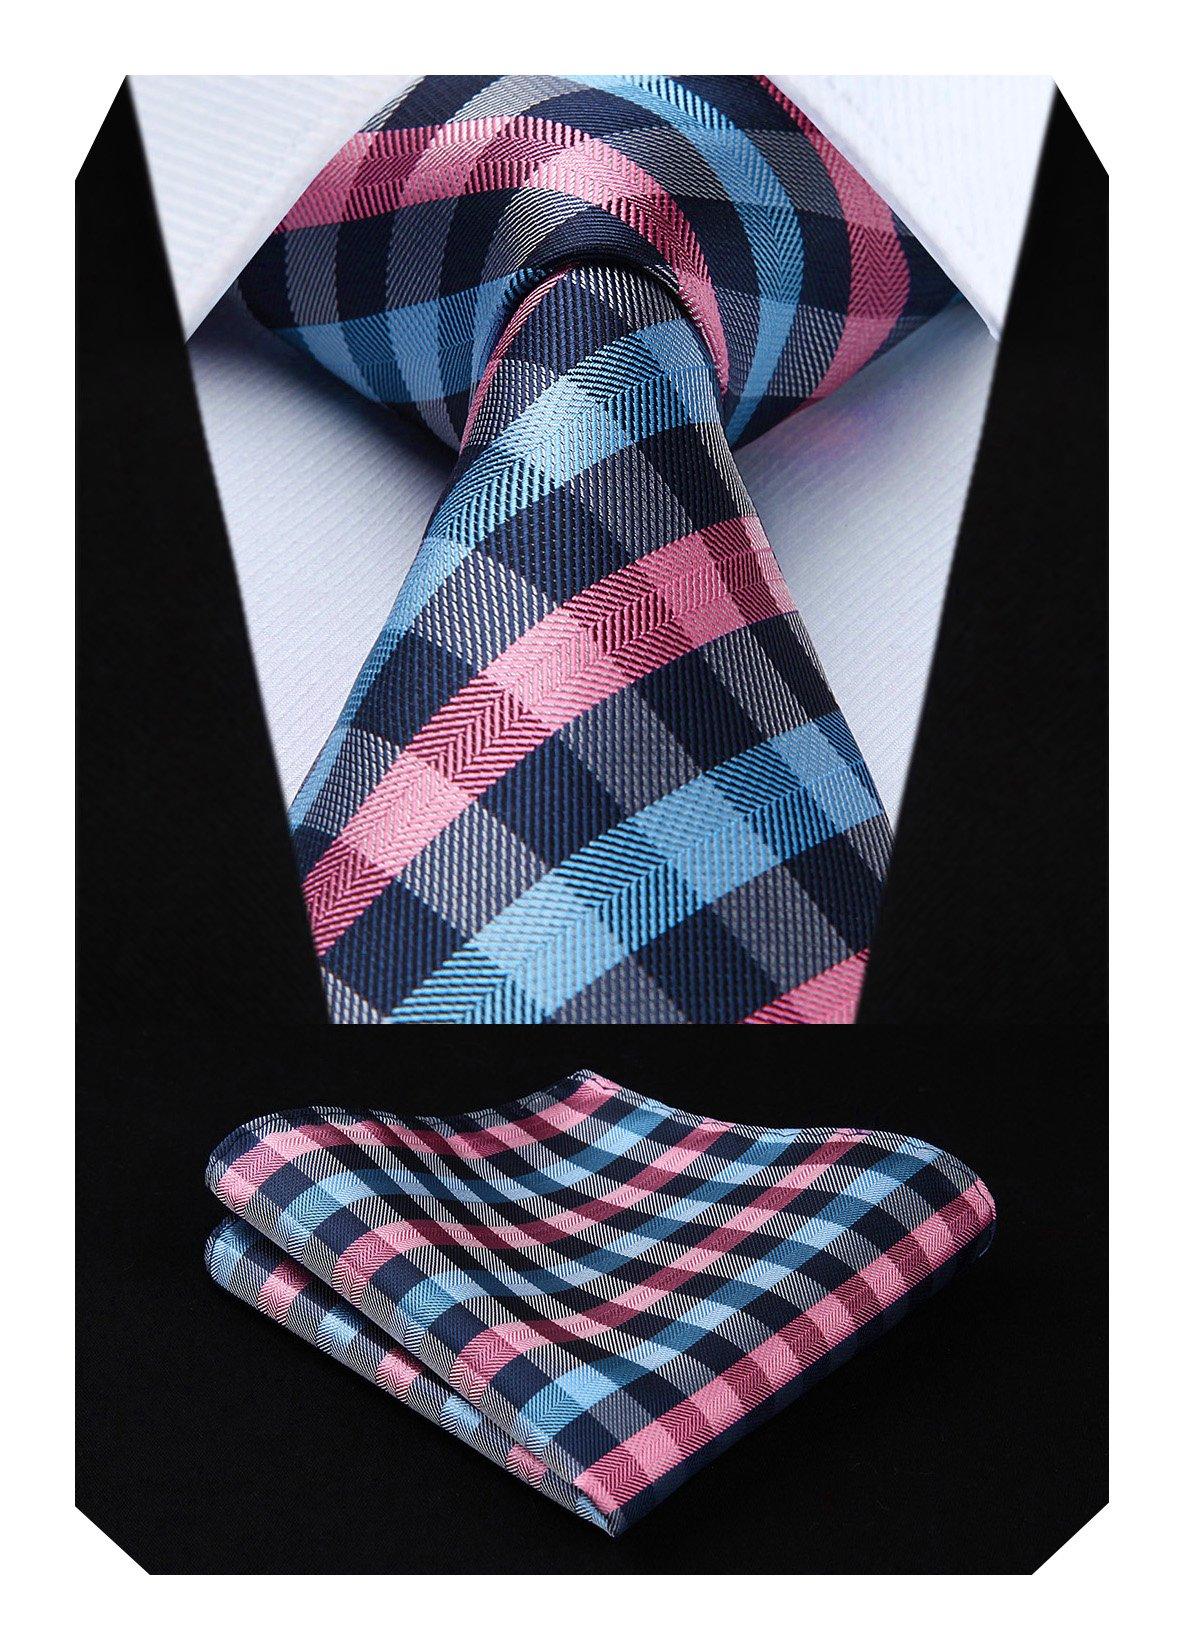 BIYINI Mens Tie Check Plaid Necktie and Pocket Square Set for Wedding Party